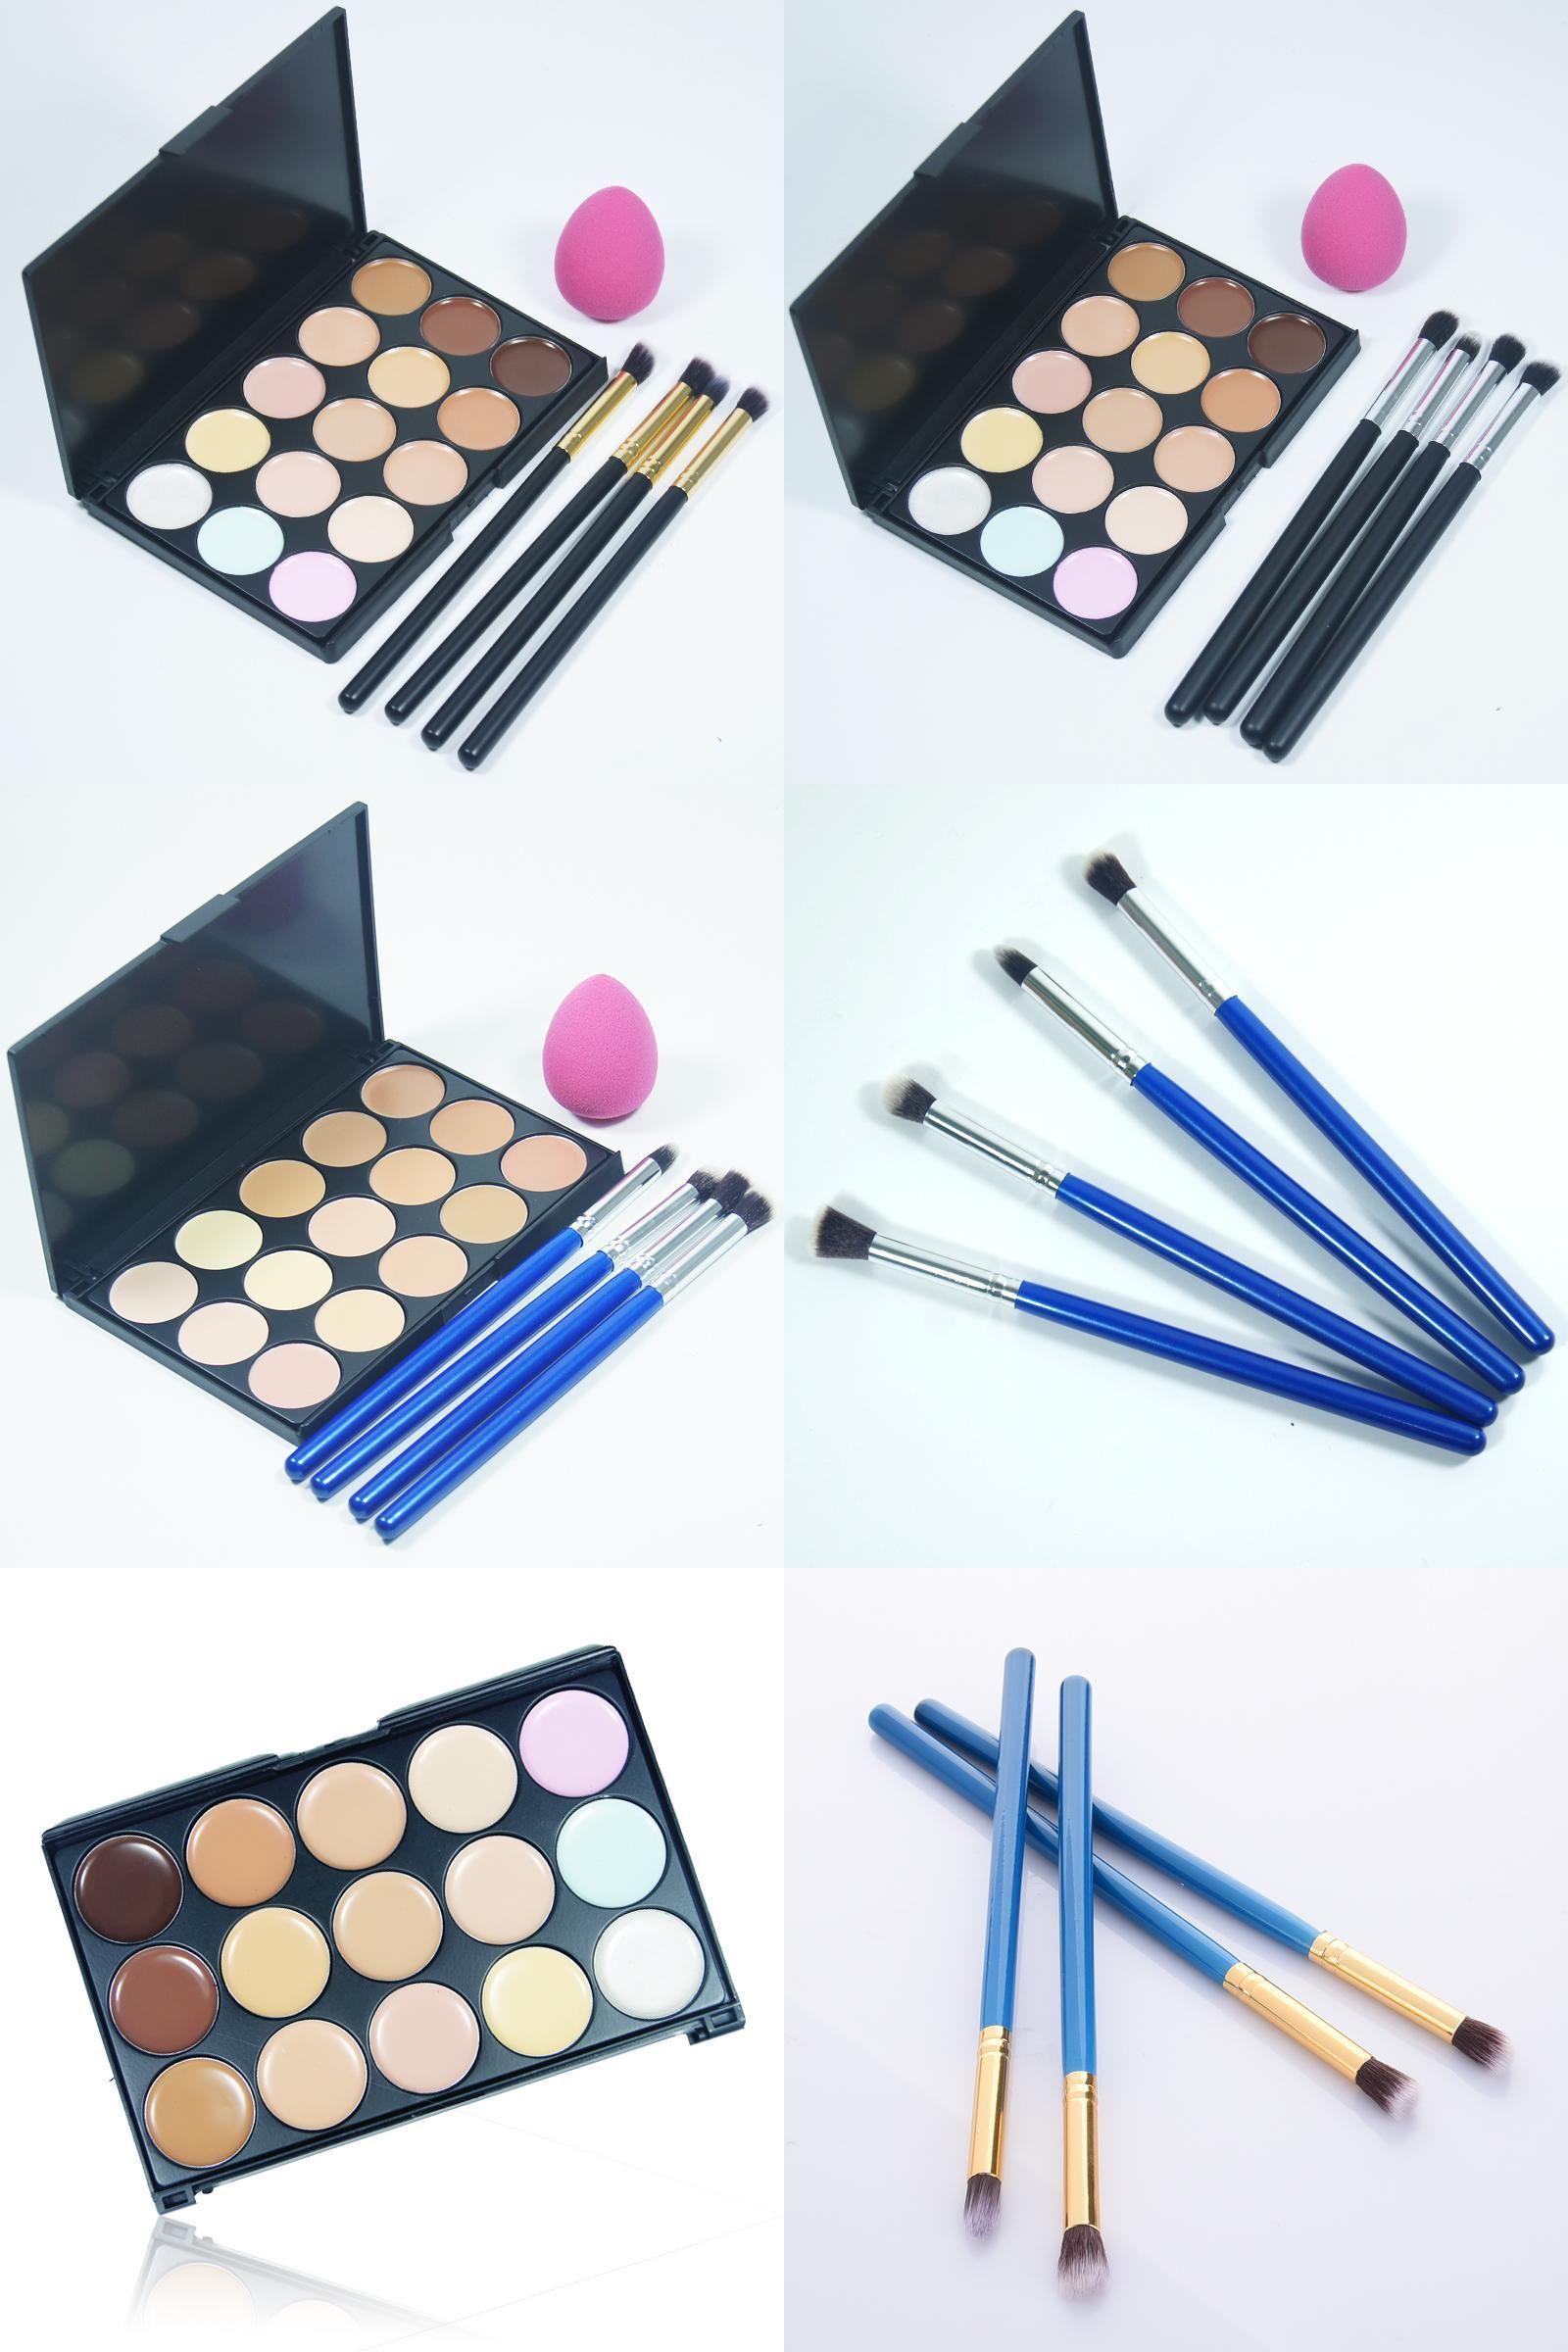 [Visit to Buy] 4pcs/set Makeup Brush And Cosmetic